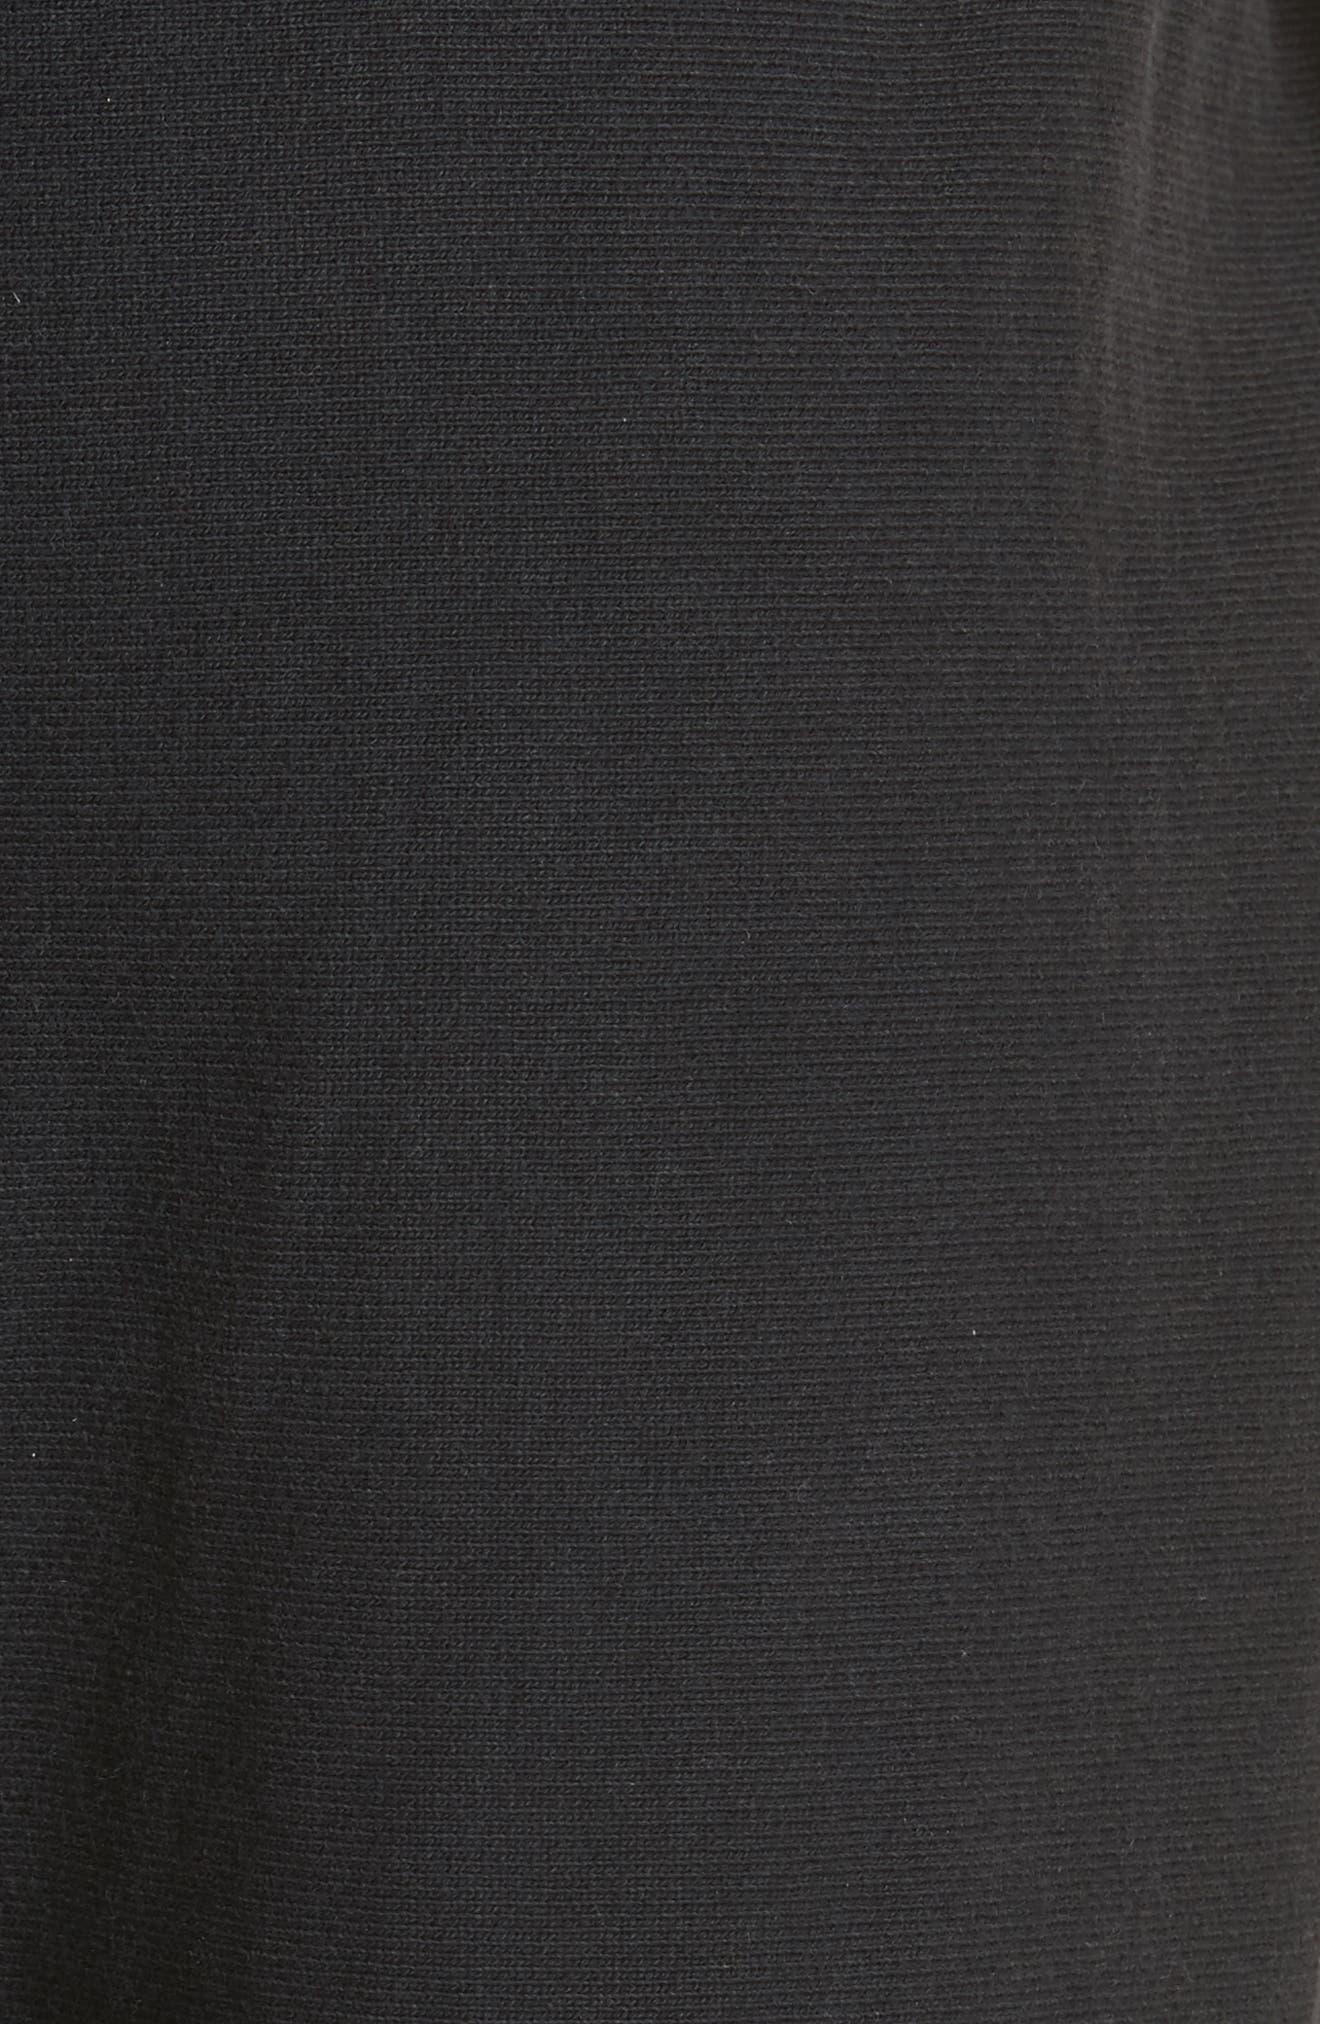 x Champion Sweatpants,                             Alternate thumbnail 5, color,                             001